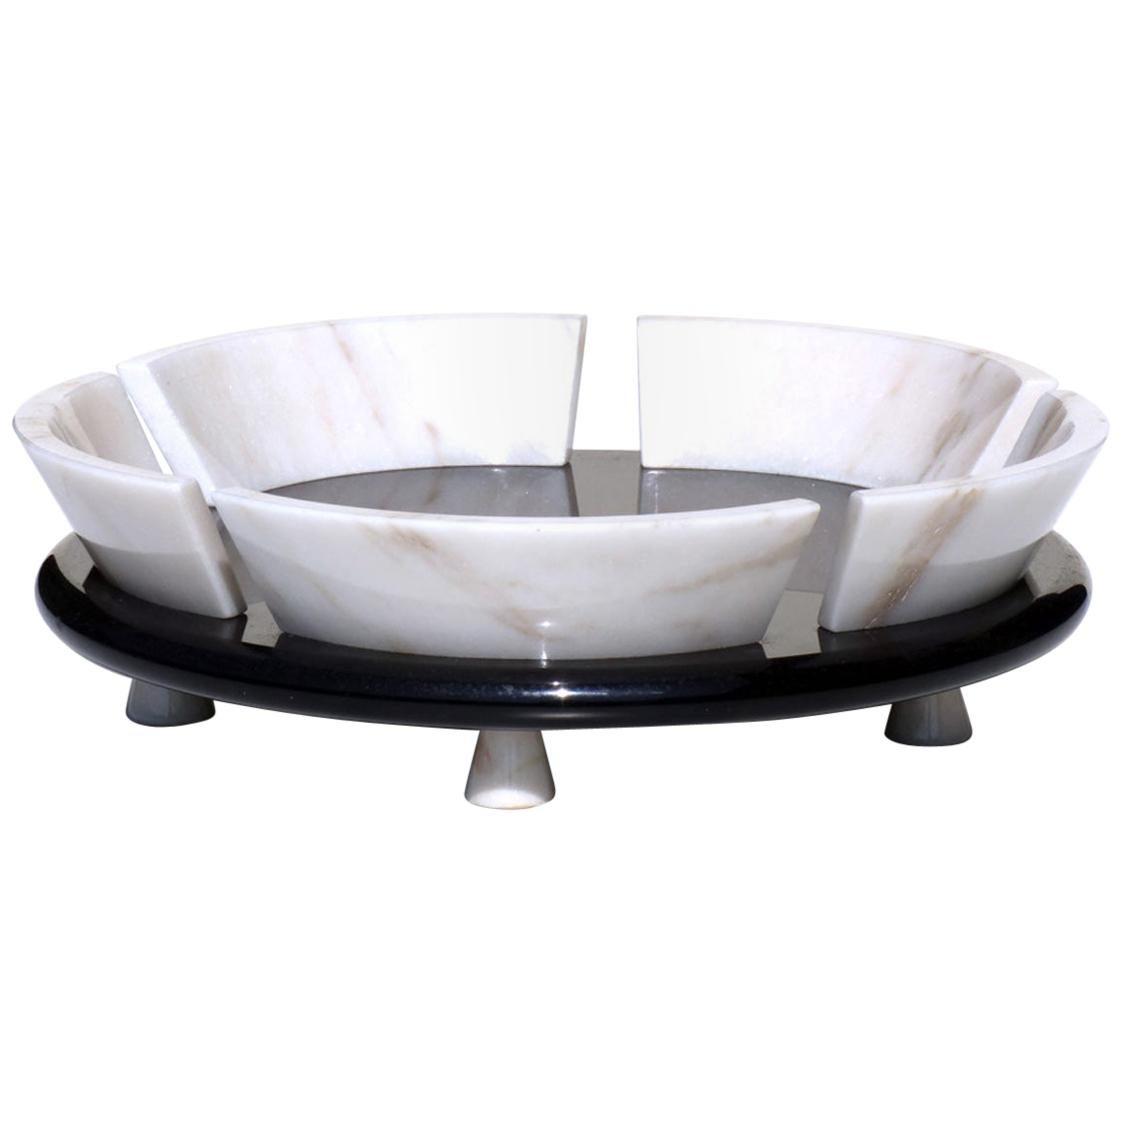 1980s Up&Up Sergio Asti Marble Fruitbowl Italian Postmodern Design Bowl